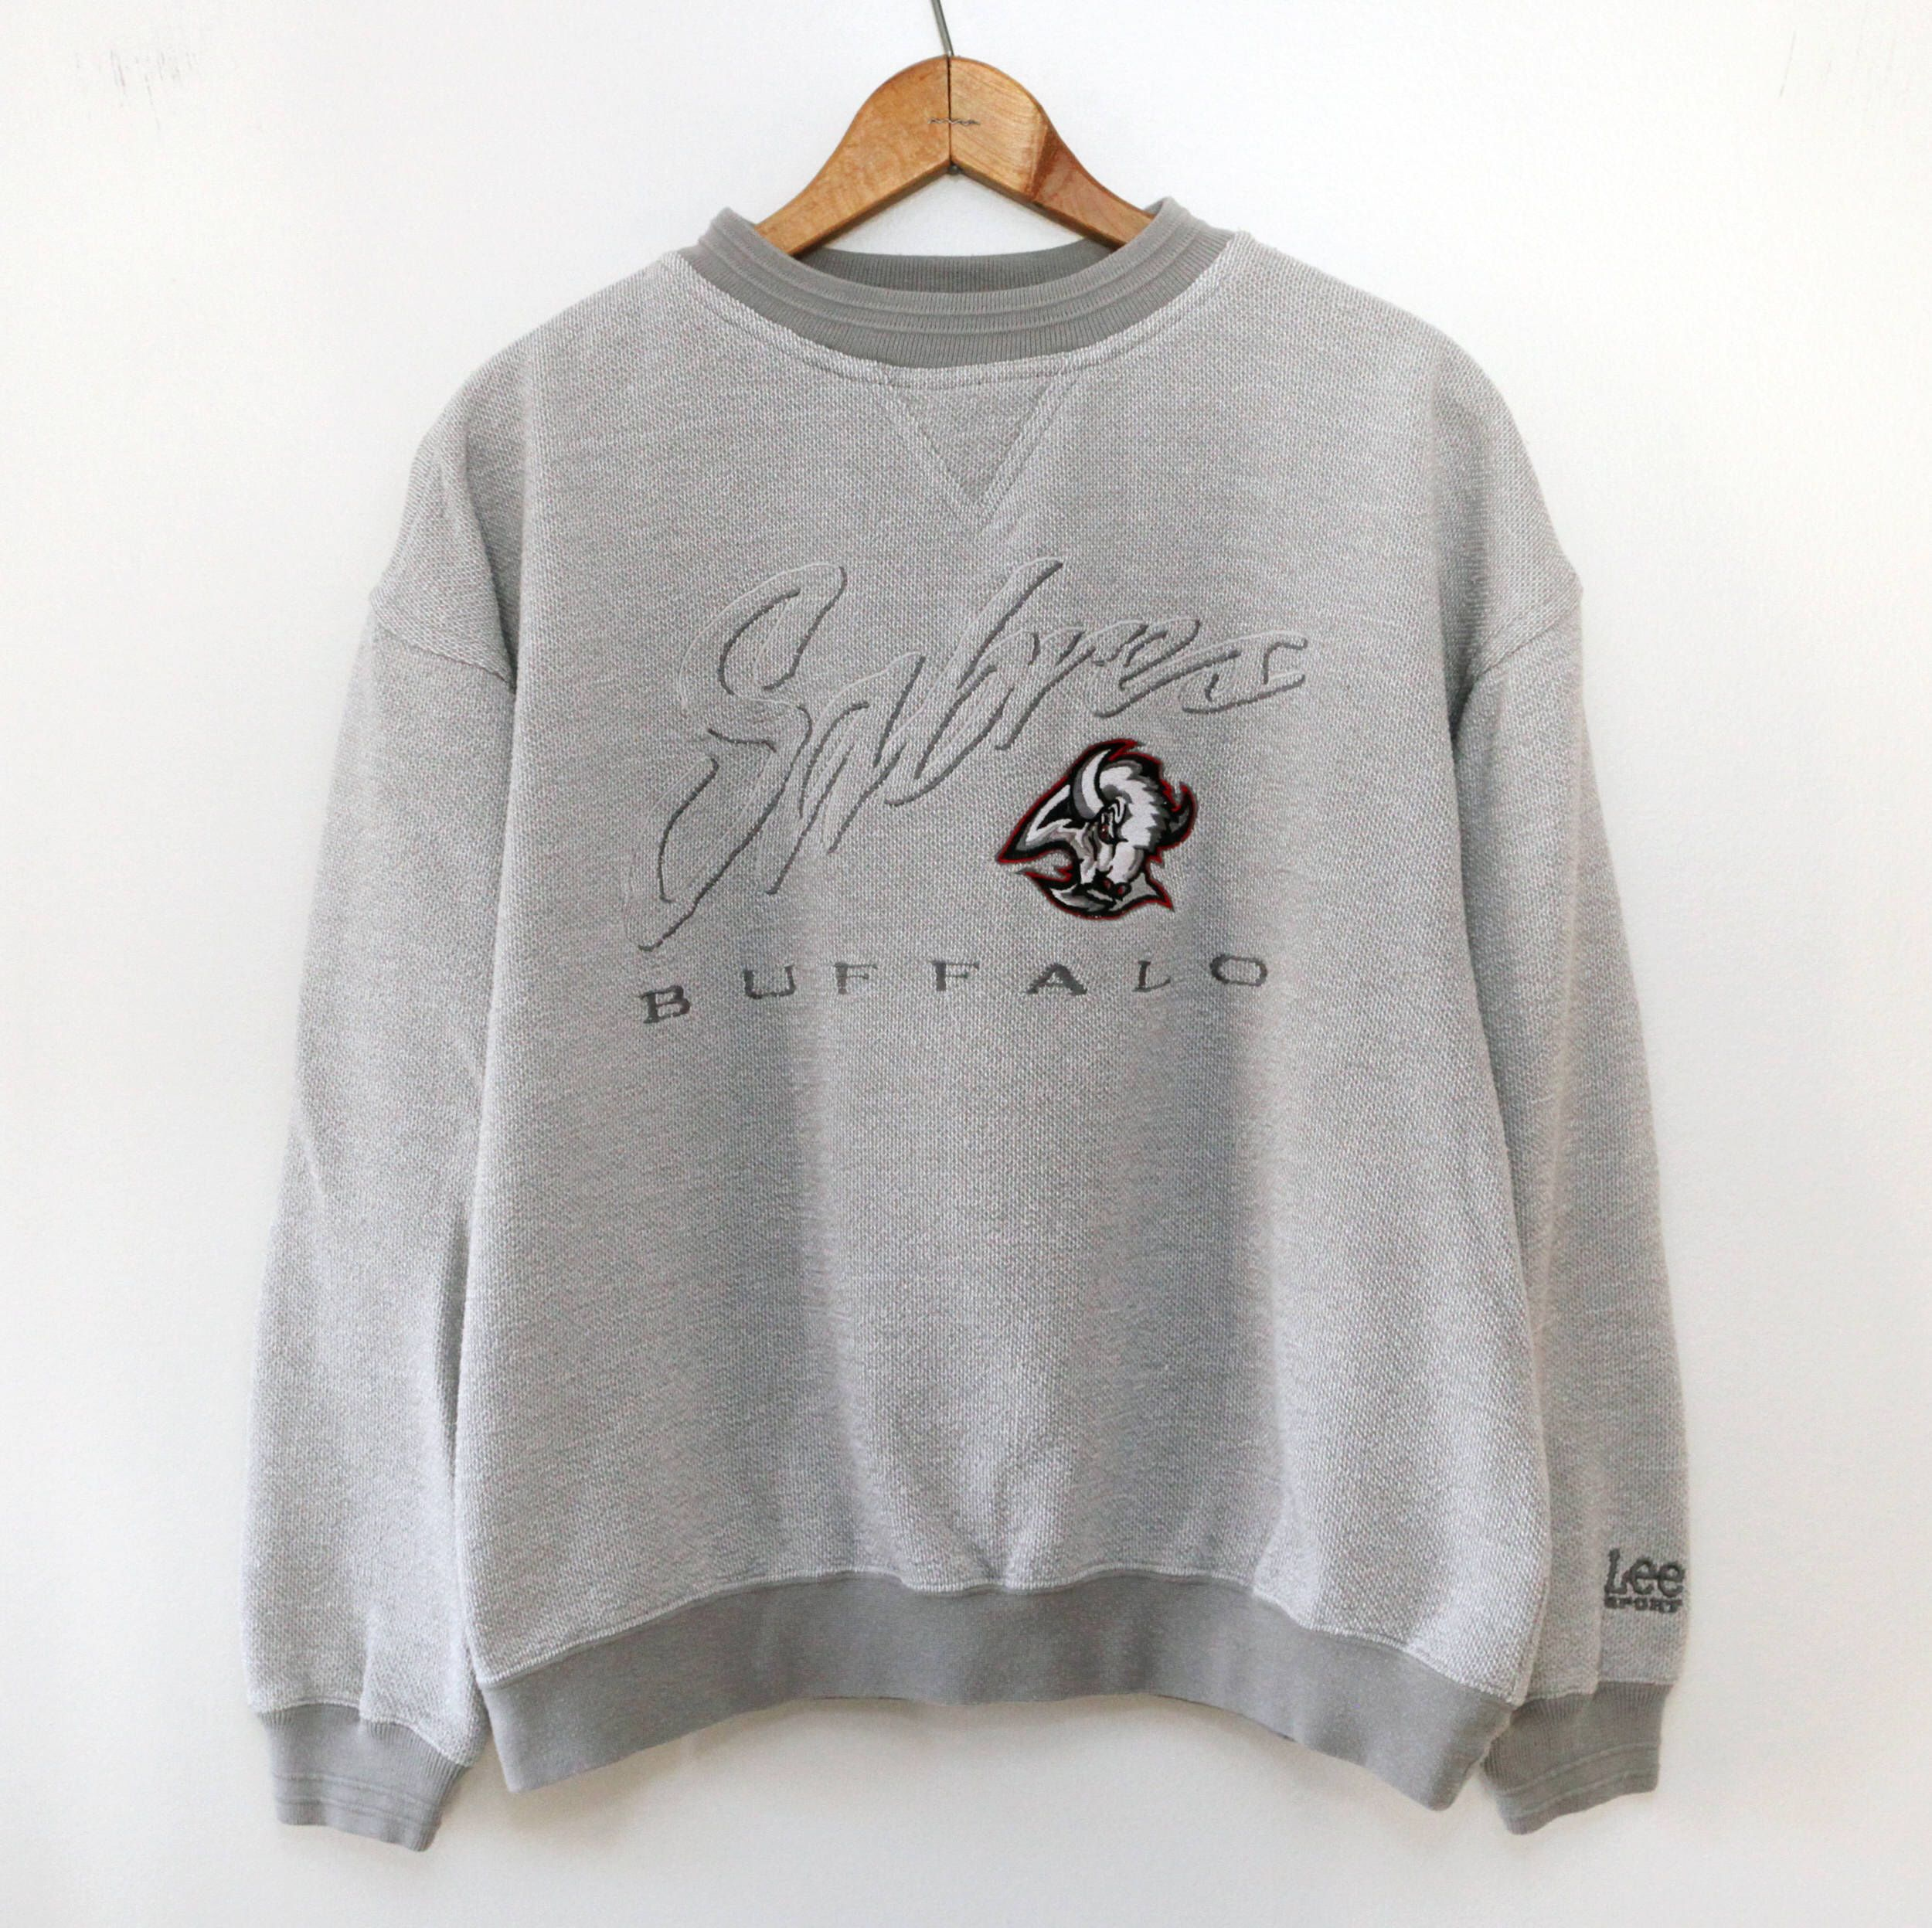 Vintage 90 S Buffalo Sabres Crewneck Sweatshirt Sz M Etsy Sweatshirts Crew Neck Sweatshirt Vintage Sportswear [ 2495 x 2500 Pixel ]